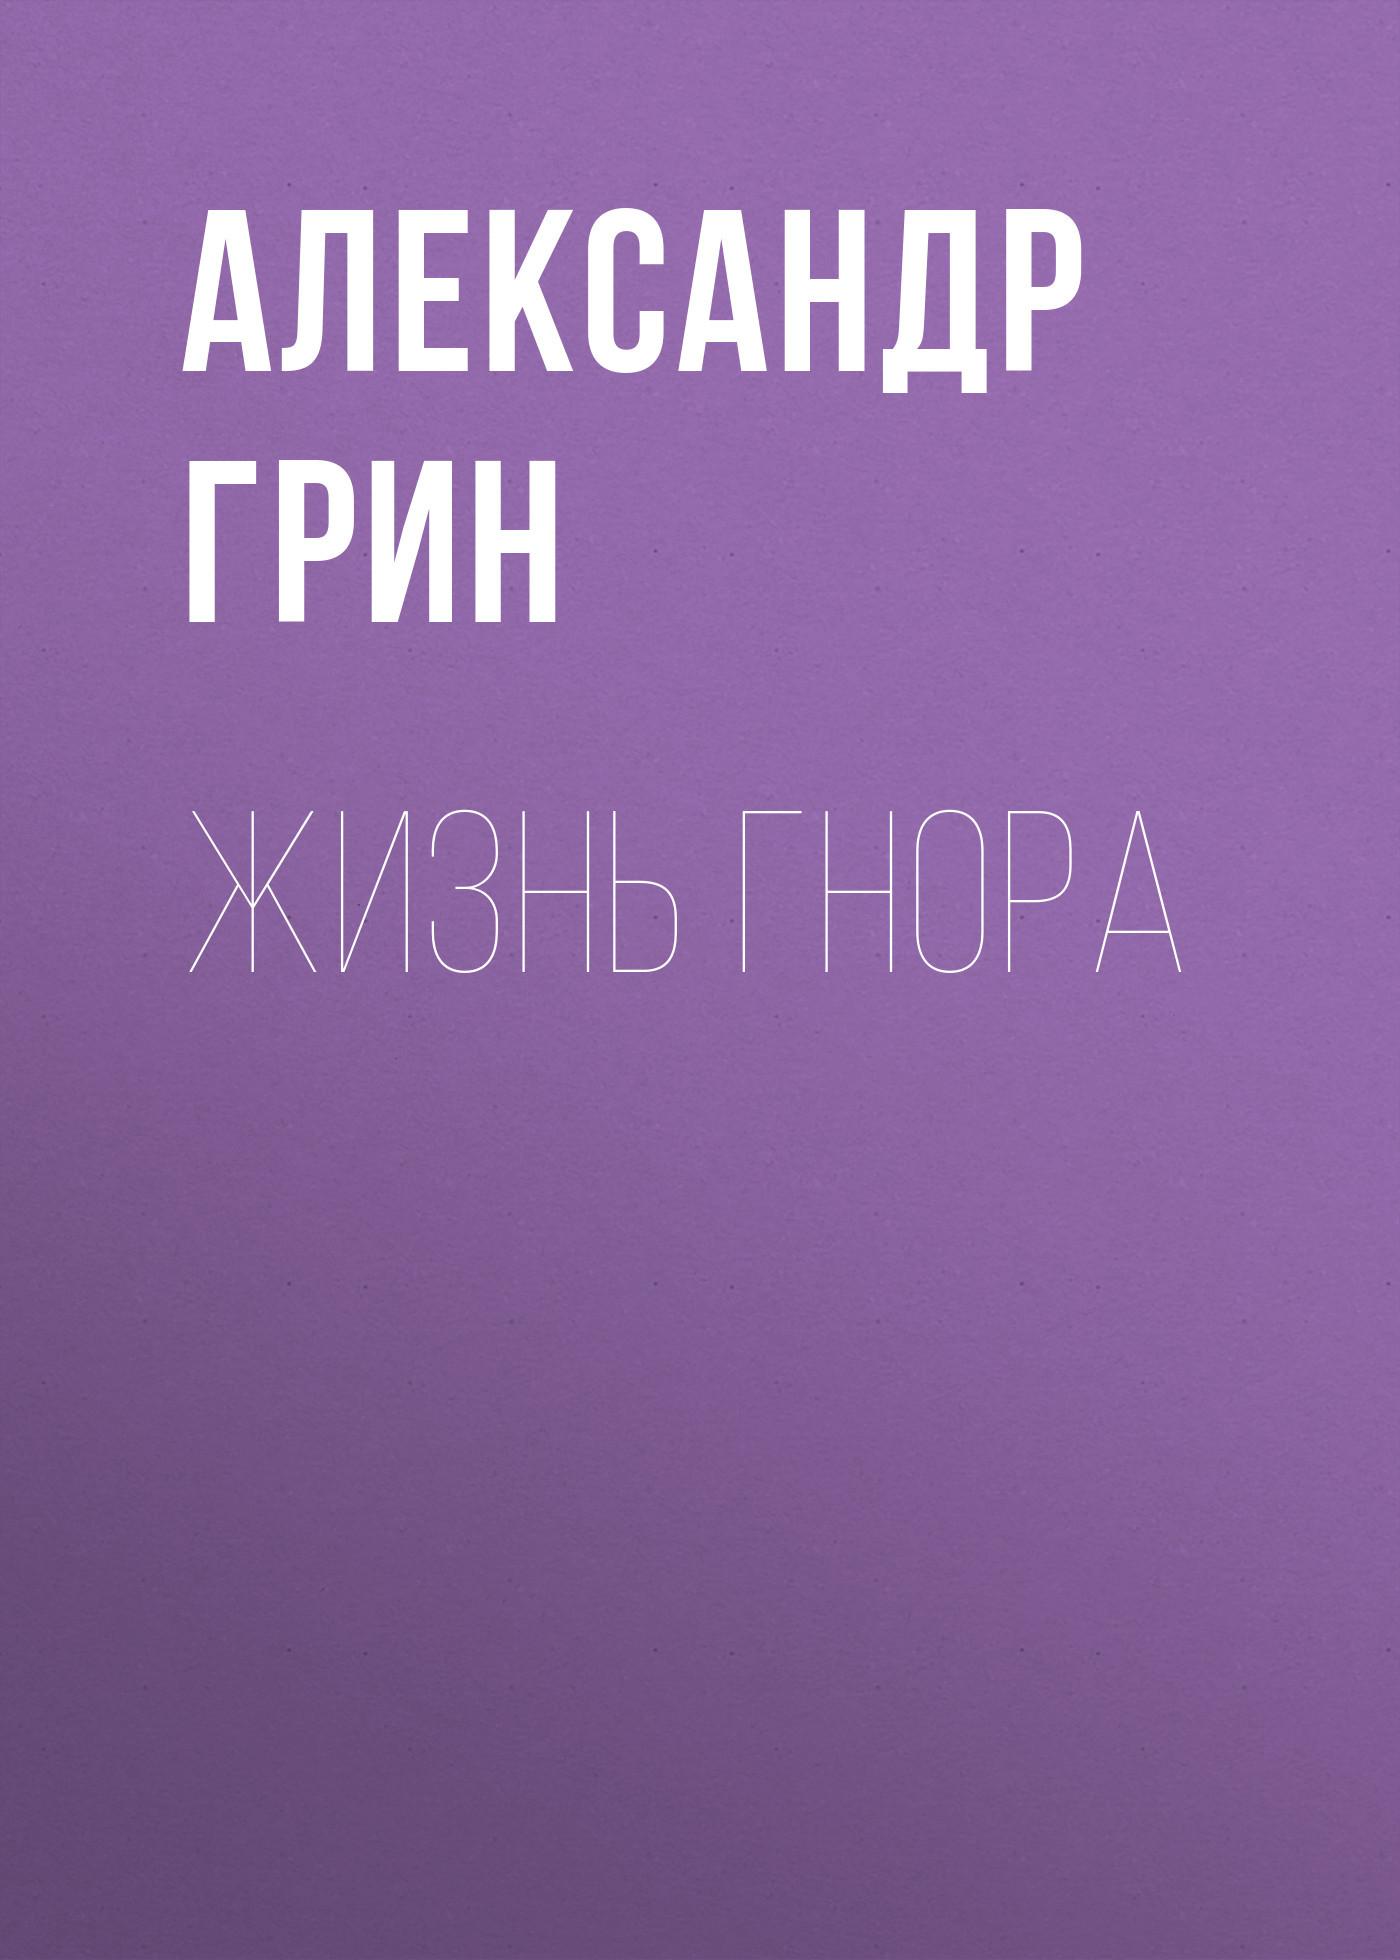 Александр Грин. Жизнь Гнора